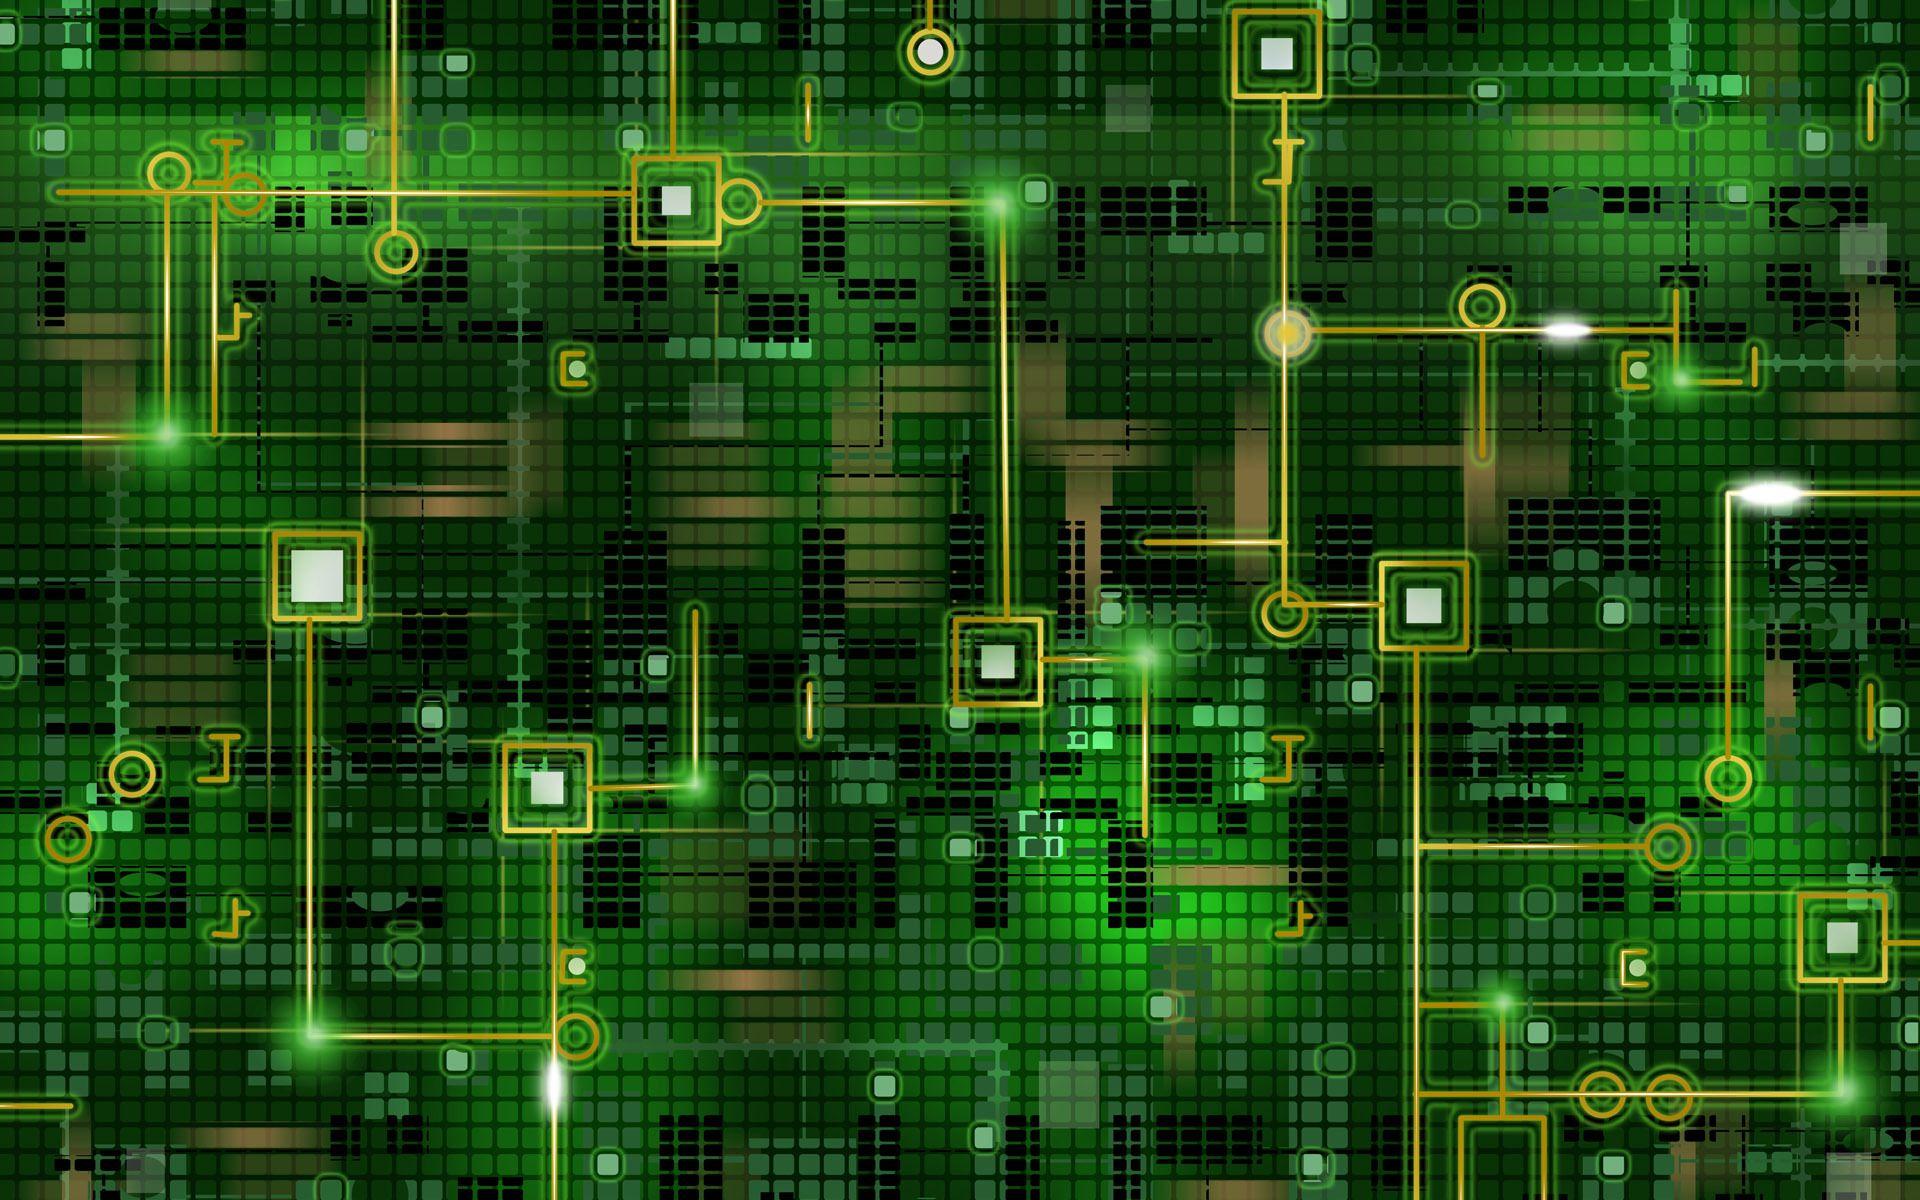 Download Digital Green Wallpapers Photo For Free Wallpaper Monodomo Digital Wallpaper Technology Wallpaper Computer Wallpaper